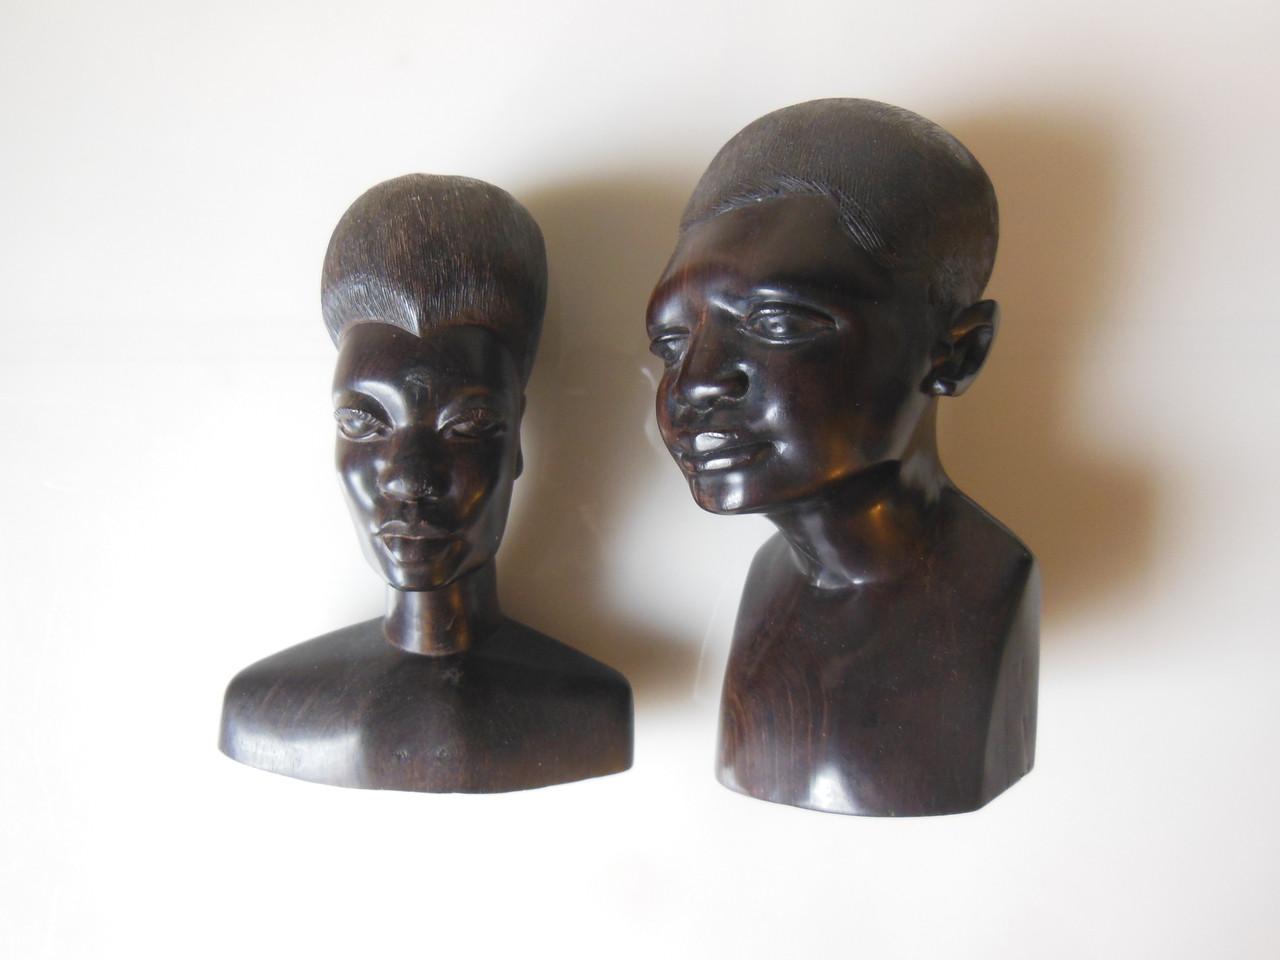 Captivating Faces - Vintage Mahogany Busts from Tanzania Mission, 1969